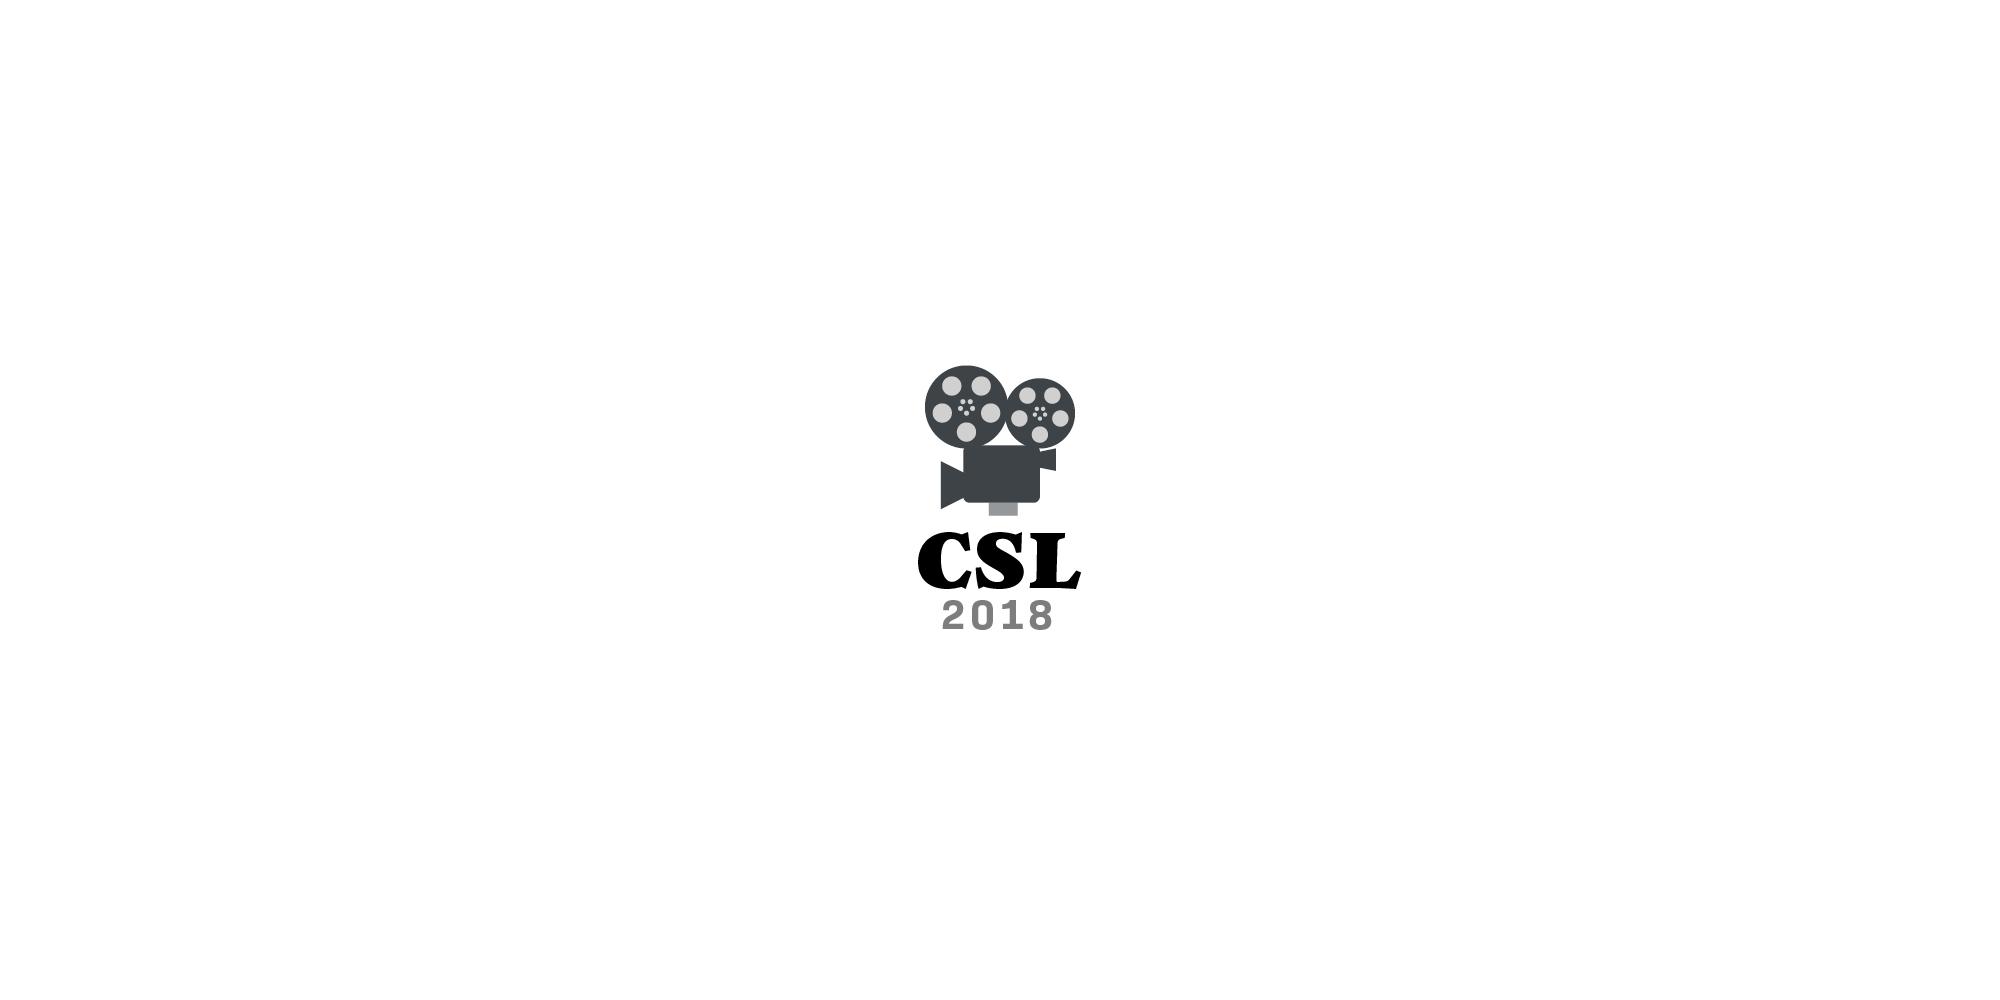 csl_movies_2018.jpg